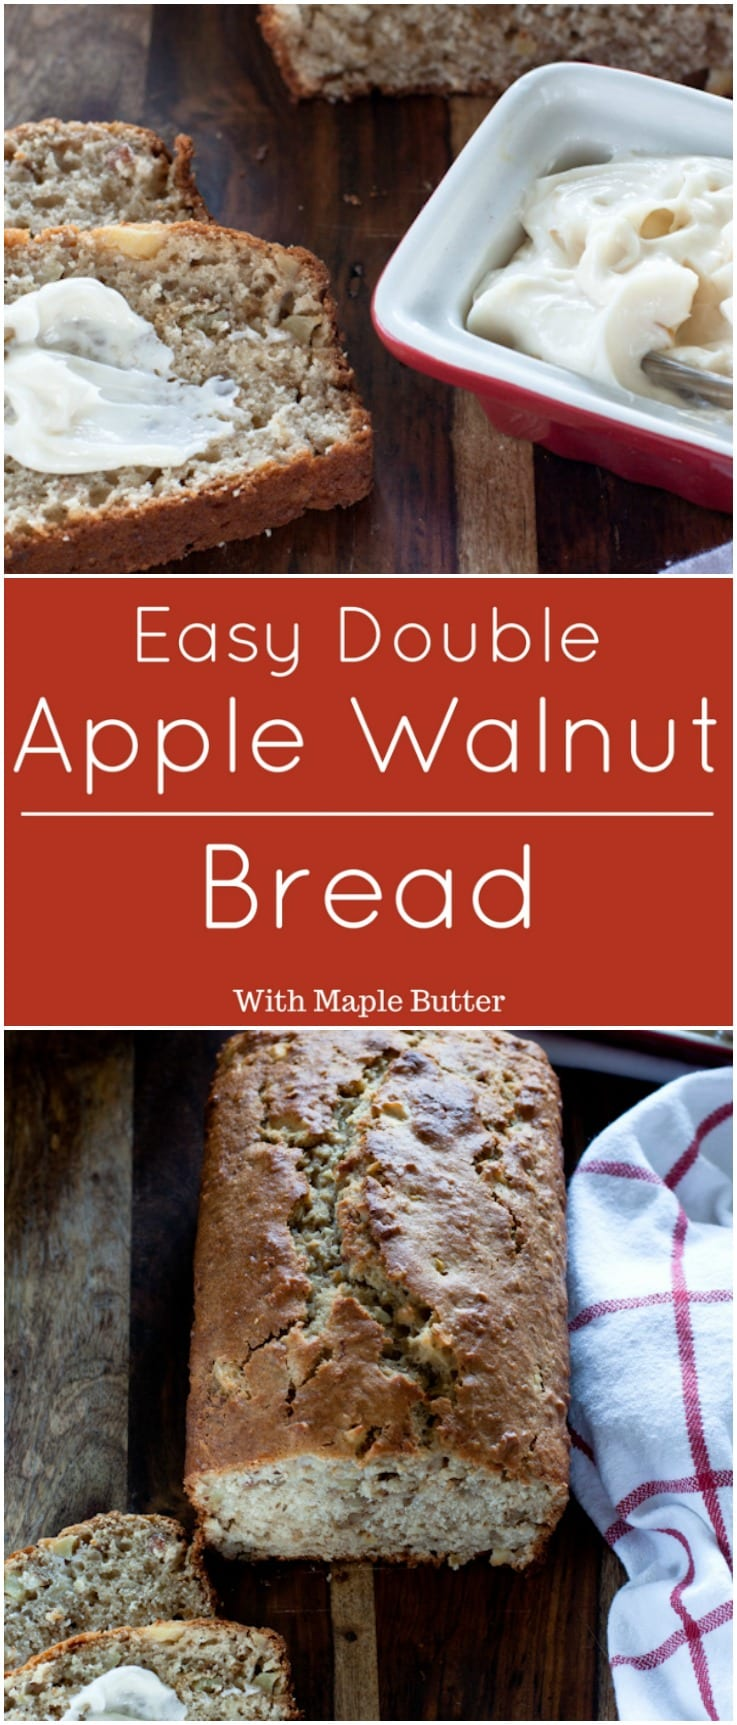 Double Apple Walnut Bread with Maple Butter.